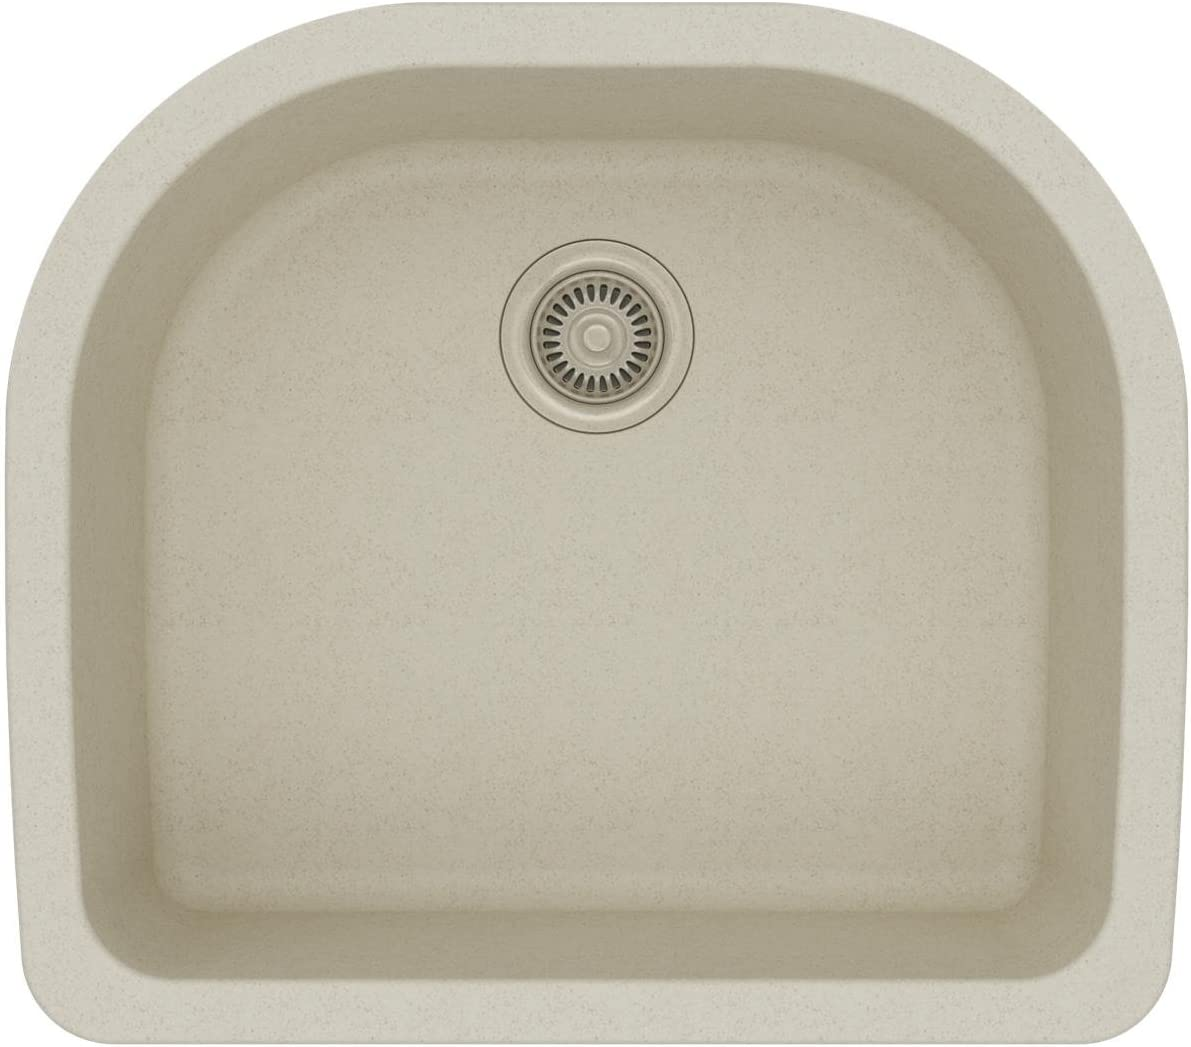 Elkay Quartz Classic ELGSU2522BQ0 Bisque Single Bowl Undermount Sink